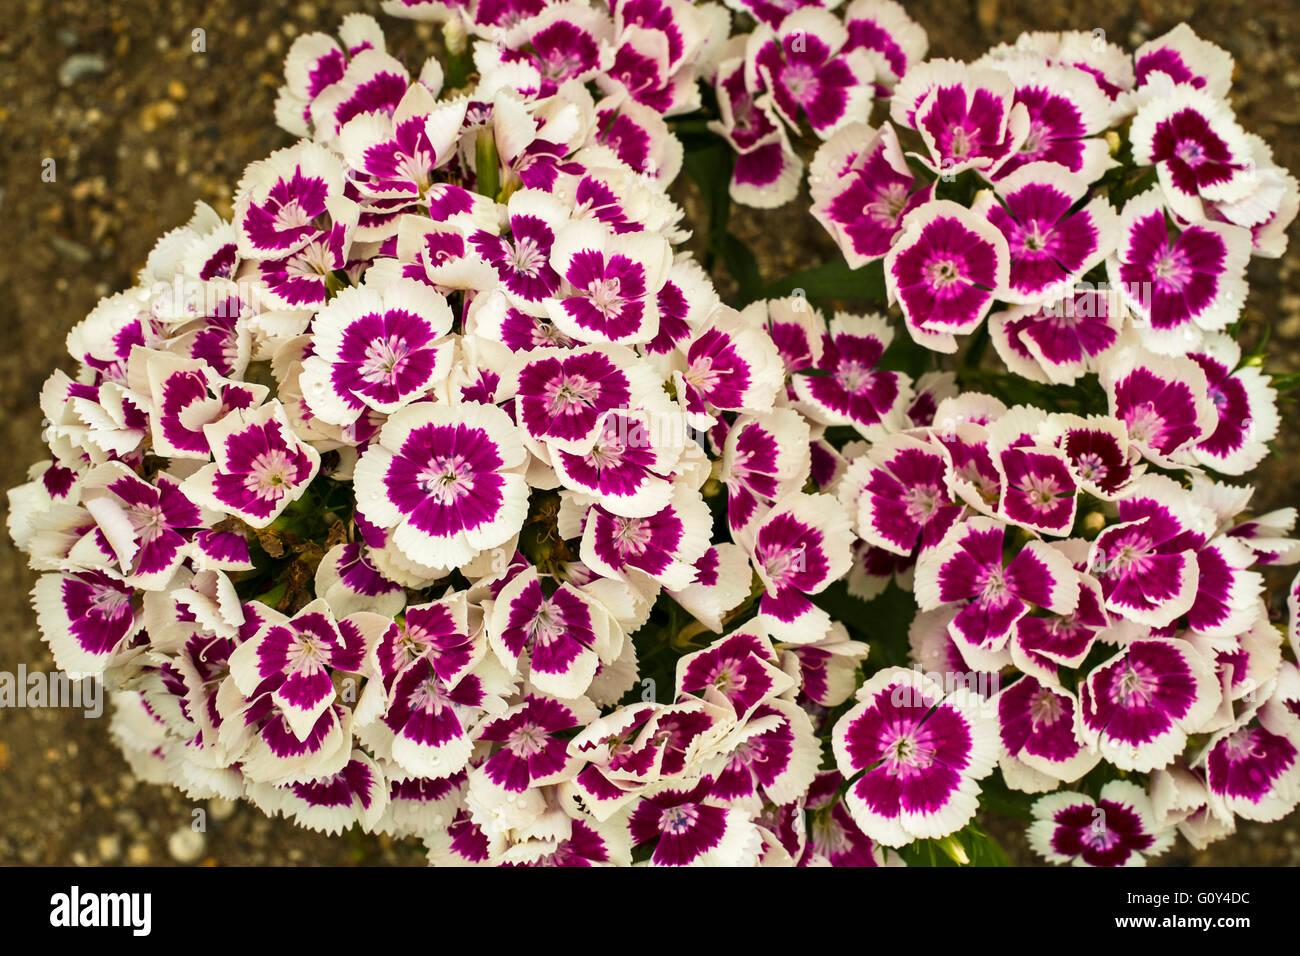 Dianthus barbatus (sweet williams) - Stock Image